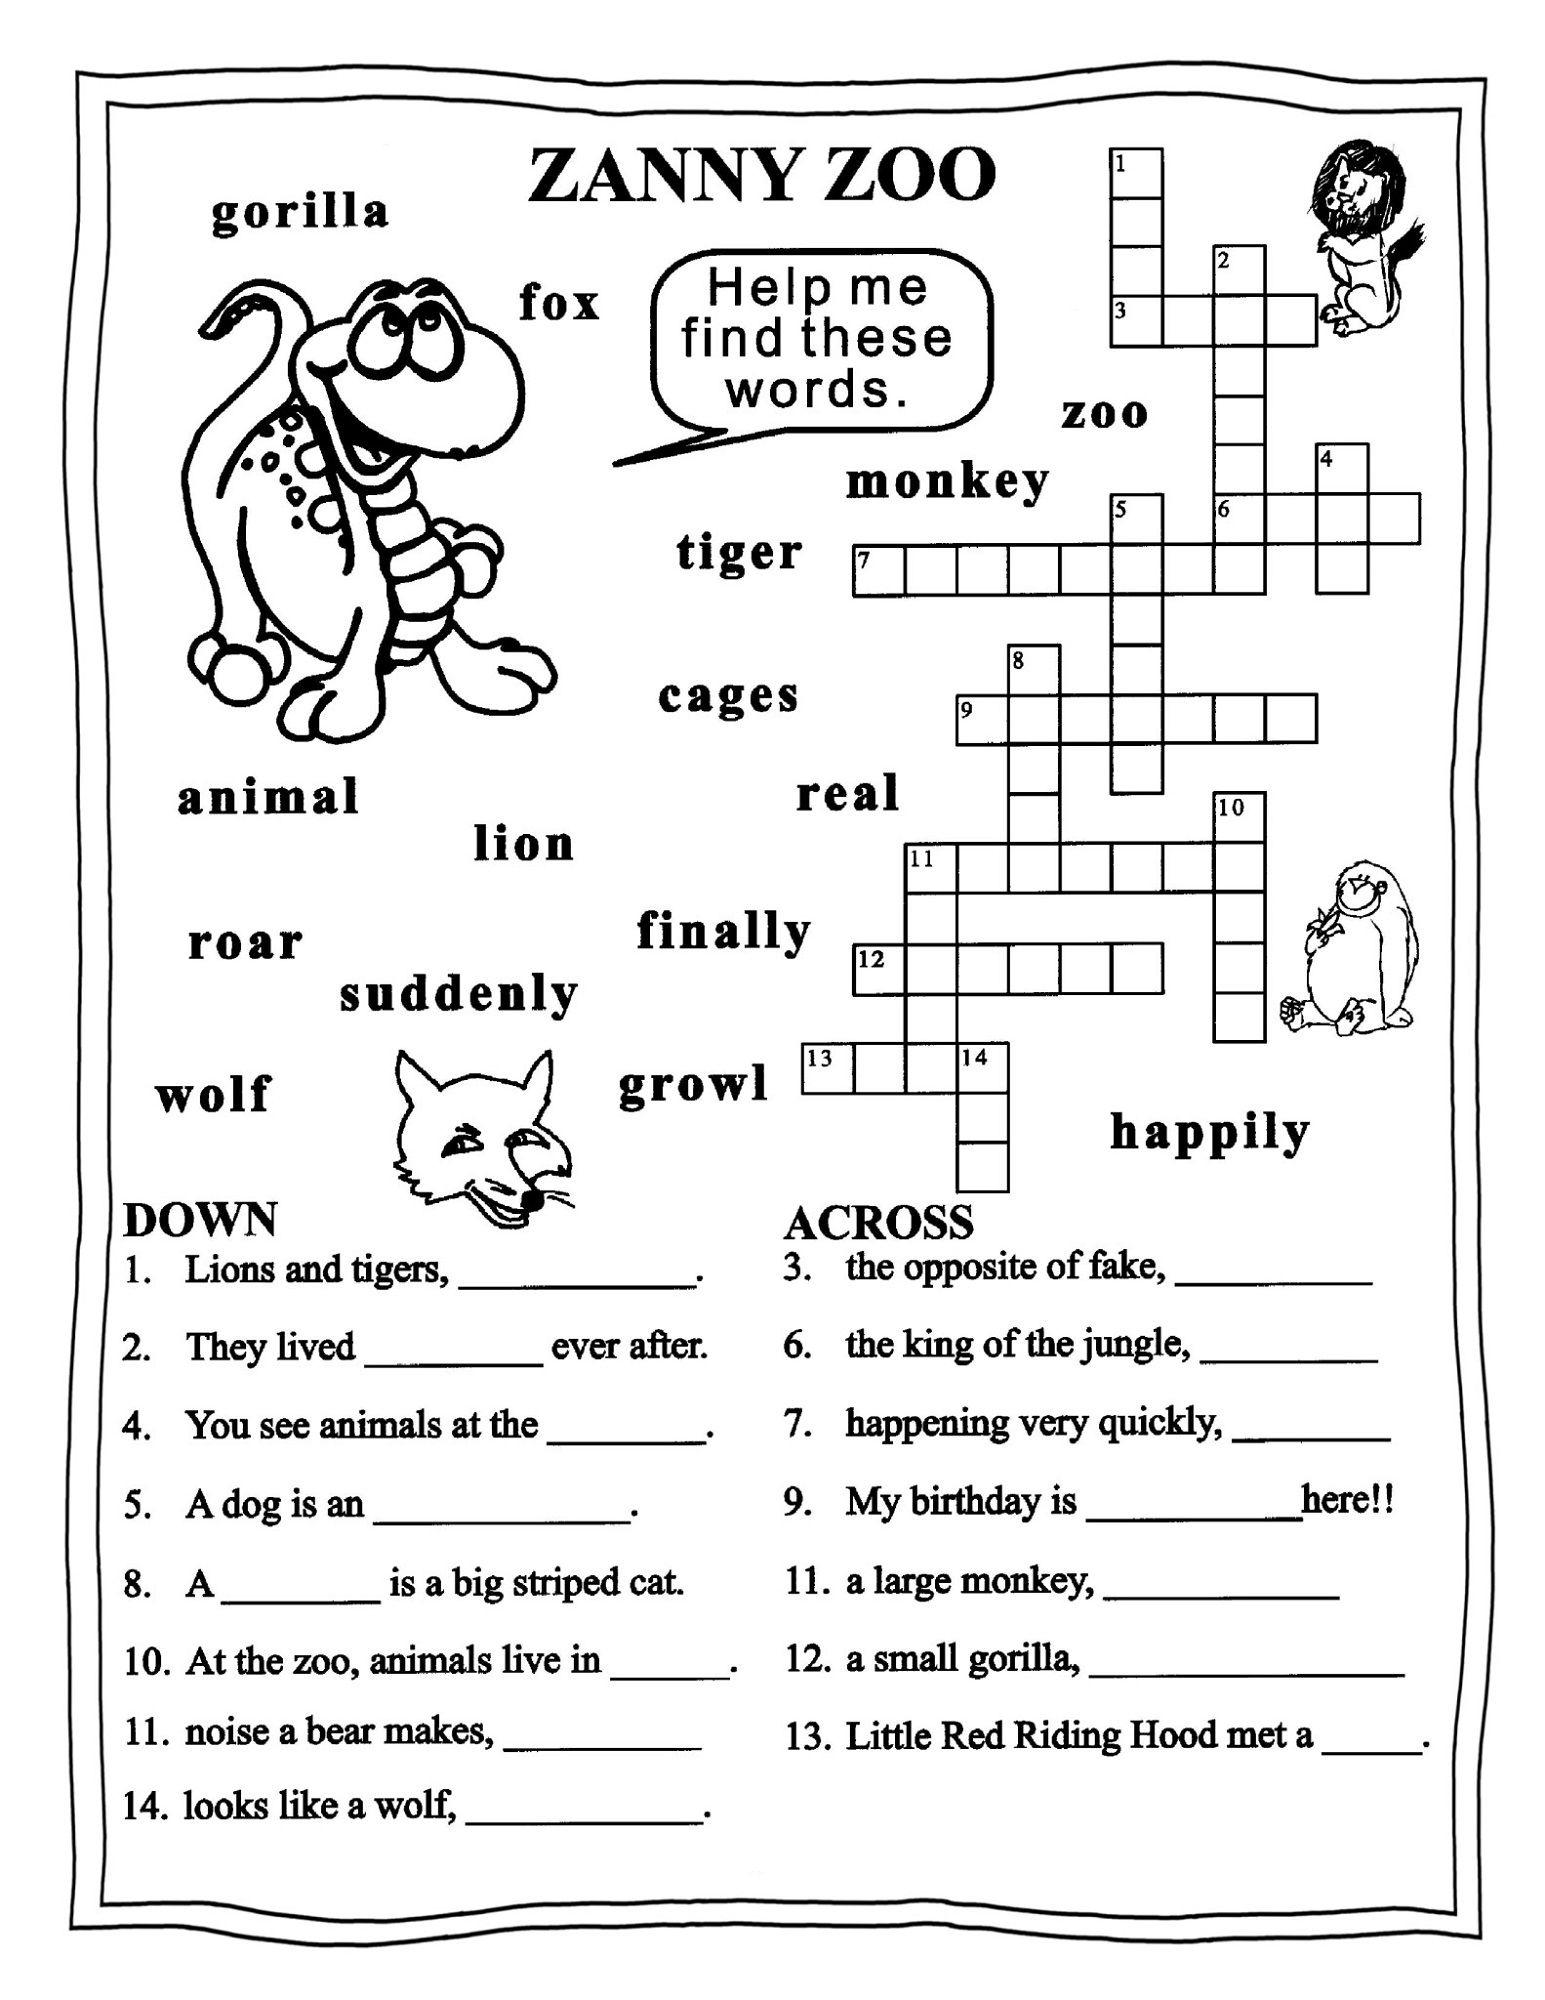 Worksheets For Grade 3 English | Learning Printable | Educative - Worksheet English Puzzle